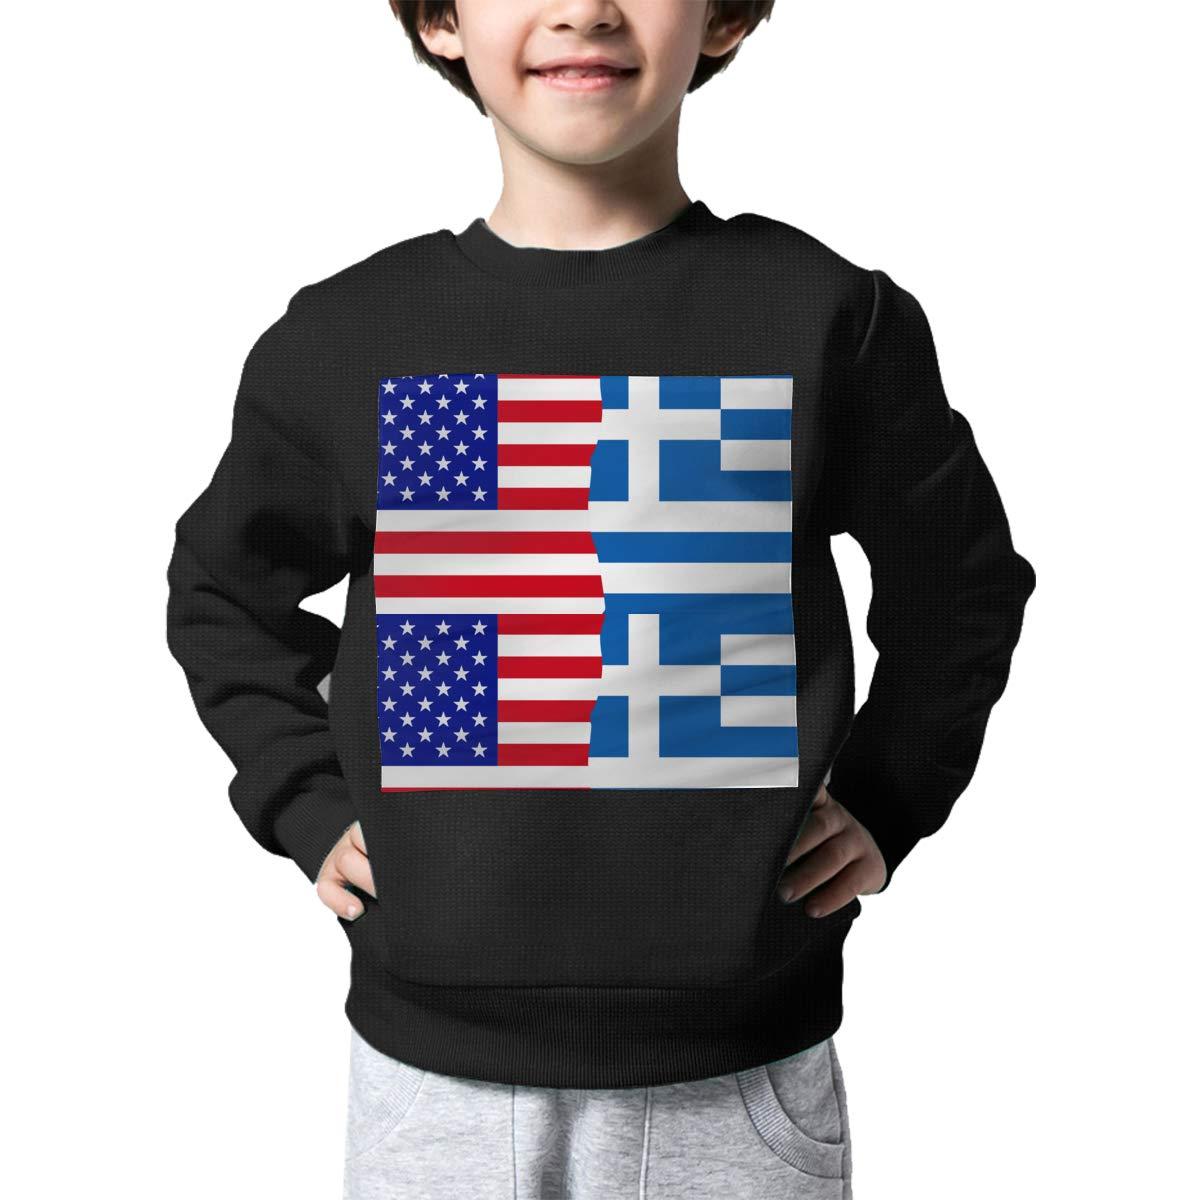 NJKM5MJ Boys Girls Half USA Half Greek Flag Lovely Sweaters Soft Warm Kids Sweater